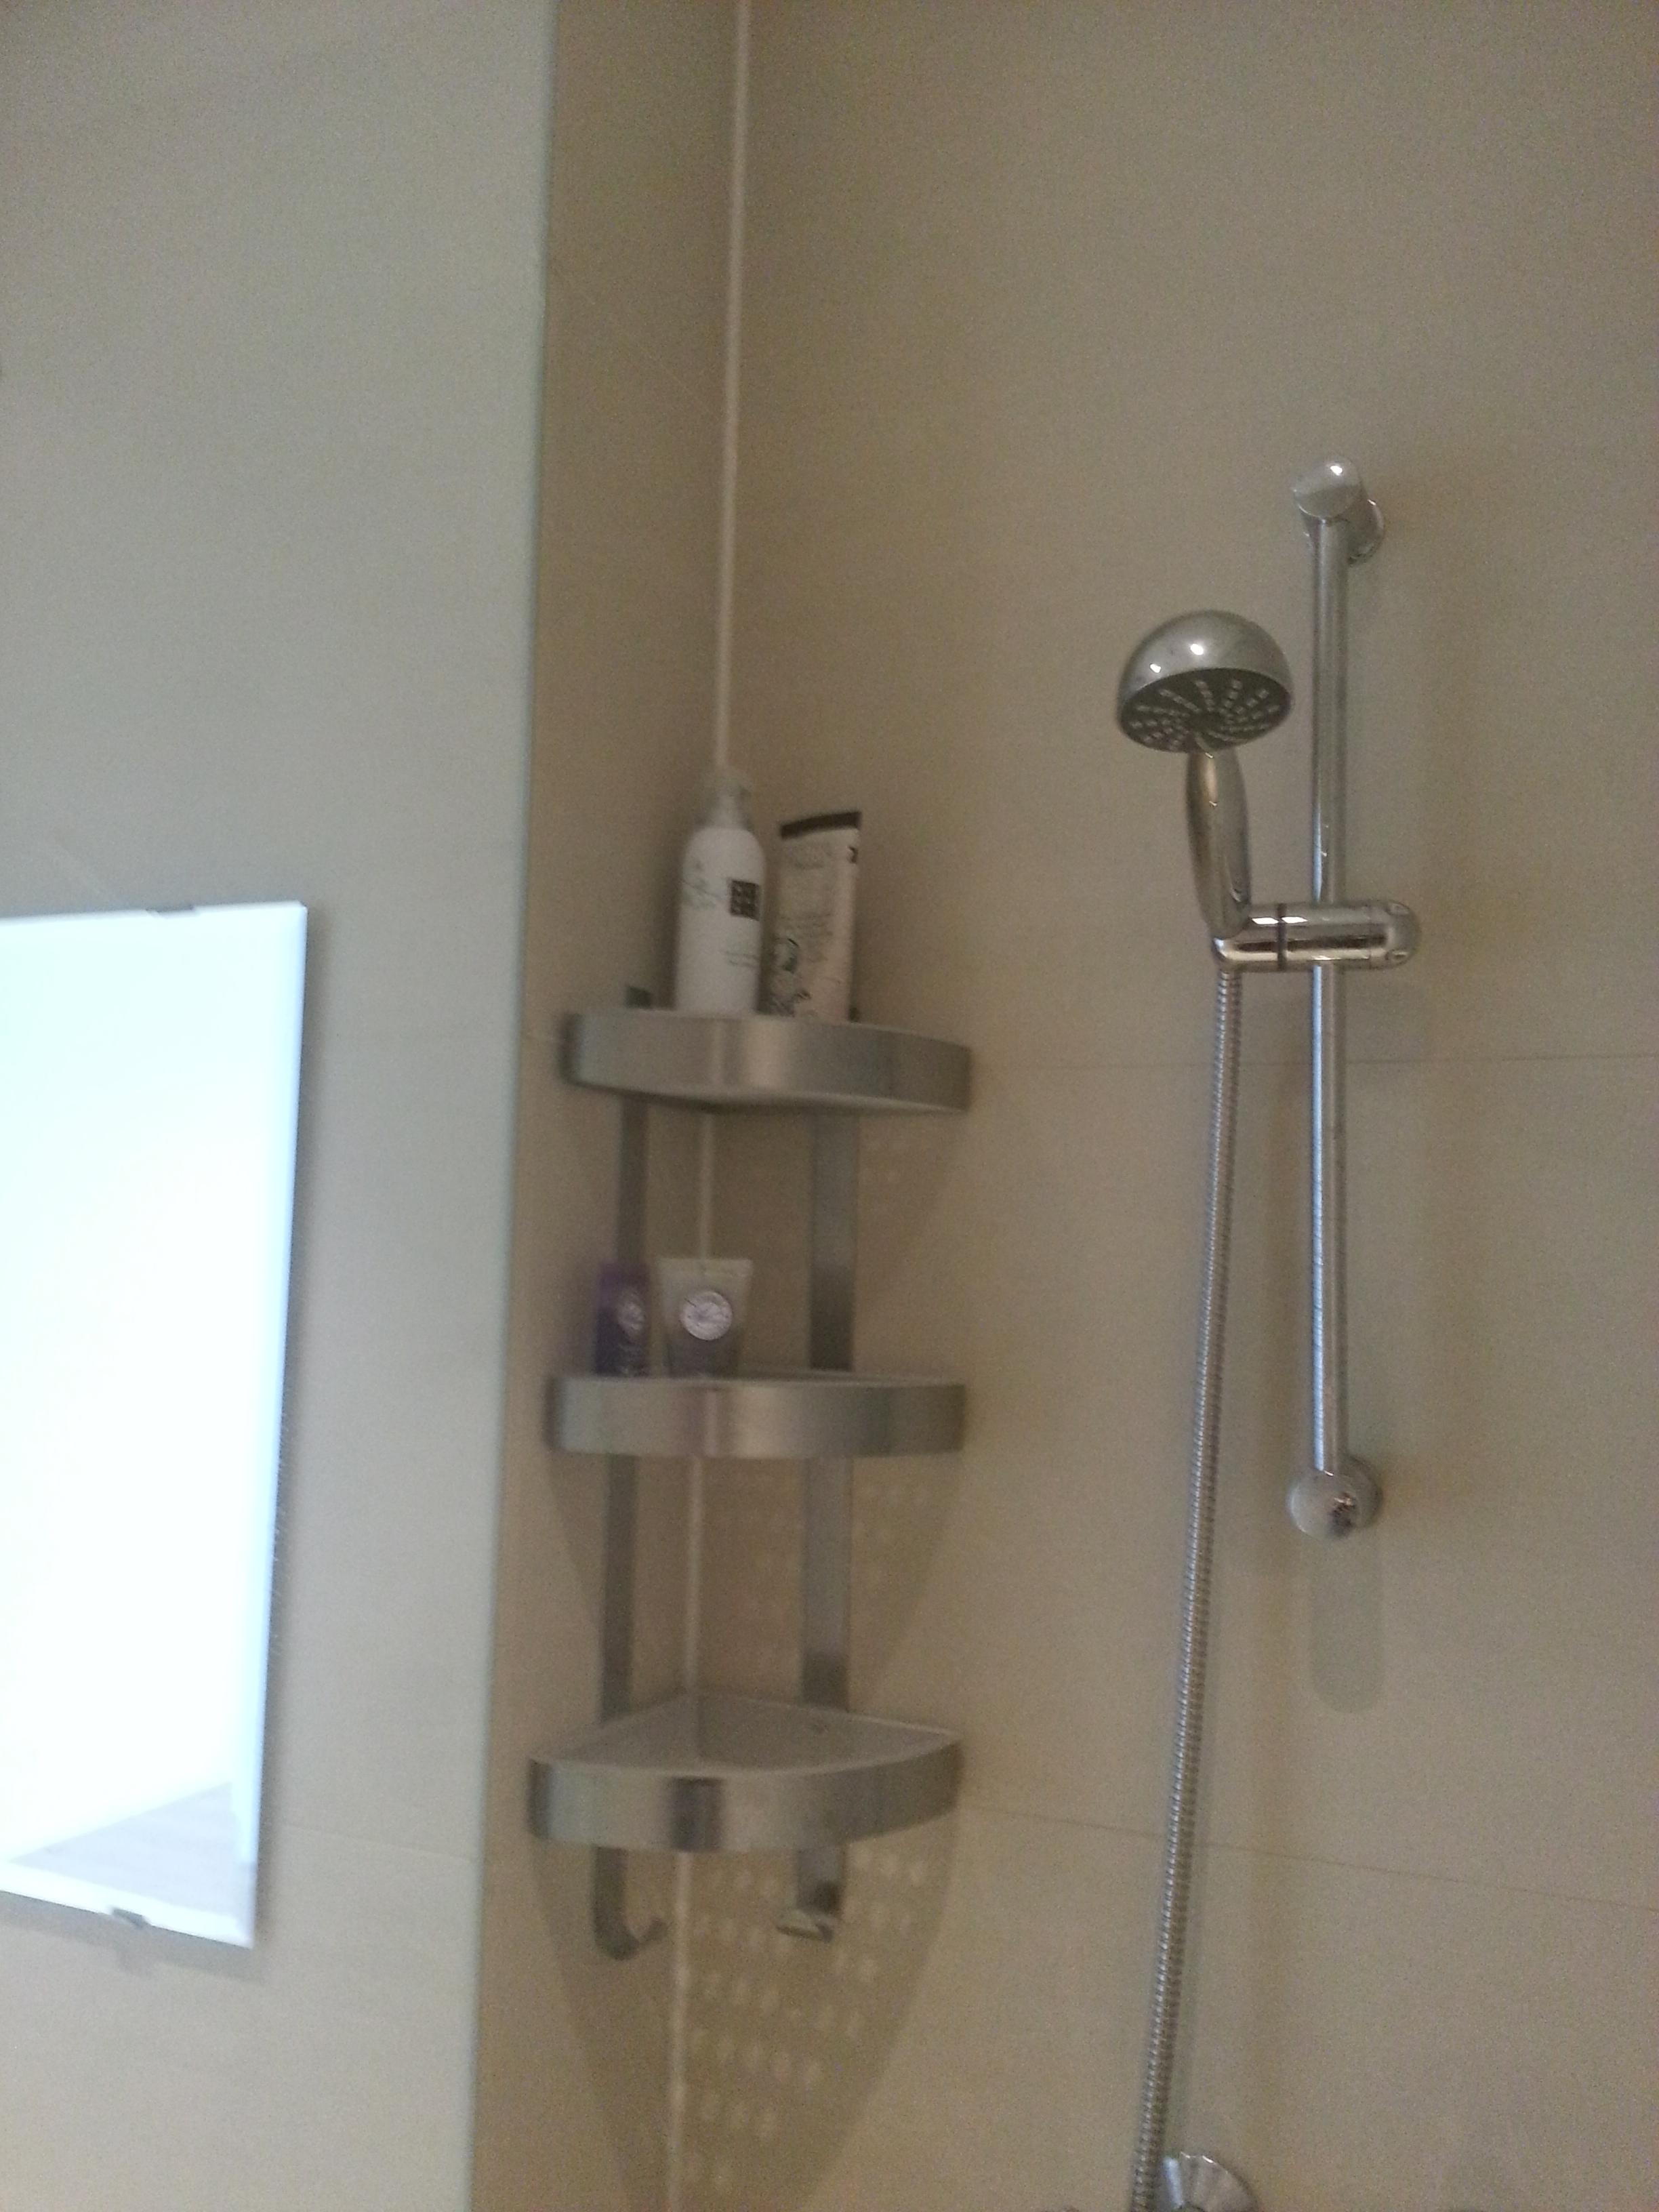 20150818 A – badkamer douche hoekrekje douchewand spiegel ...